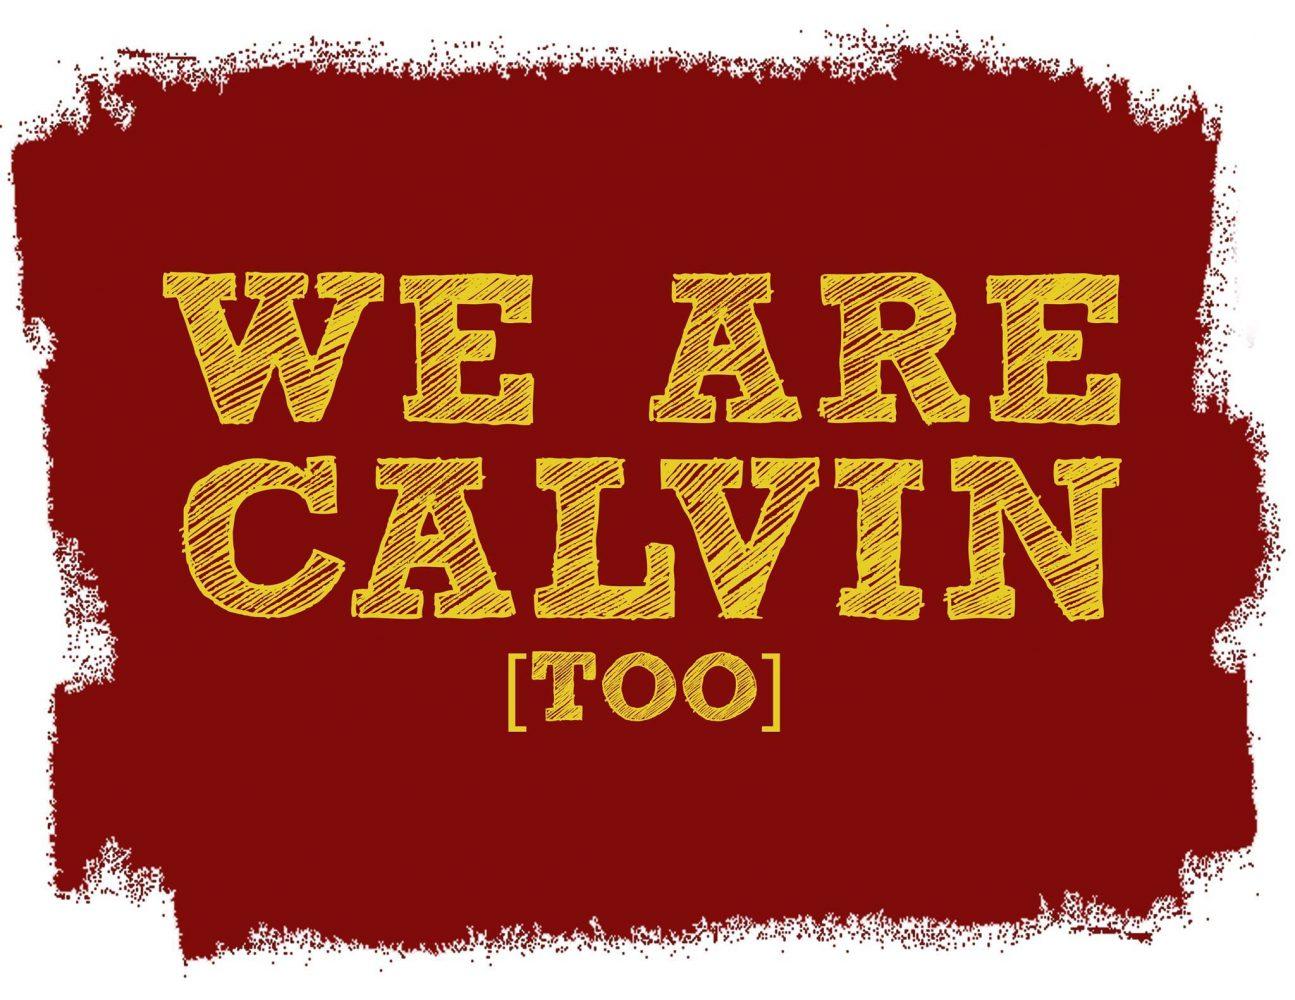 Photo courtesy We are Calvin [too]